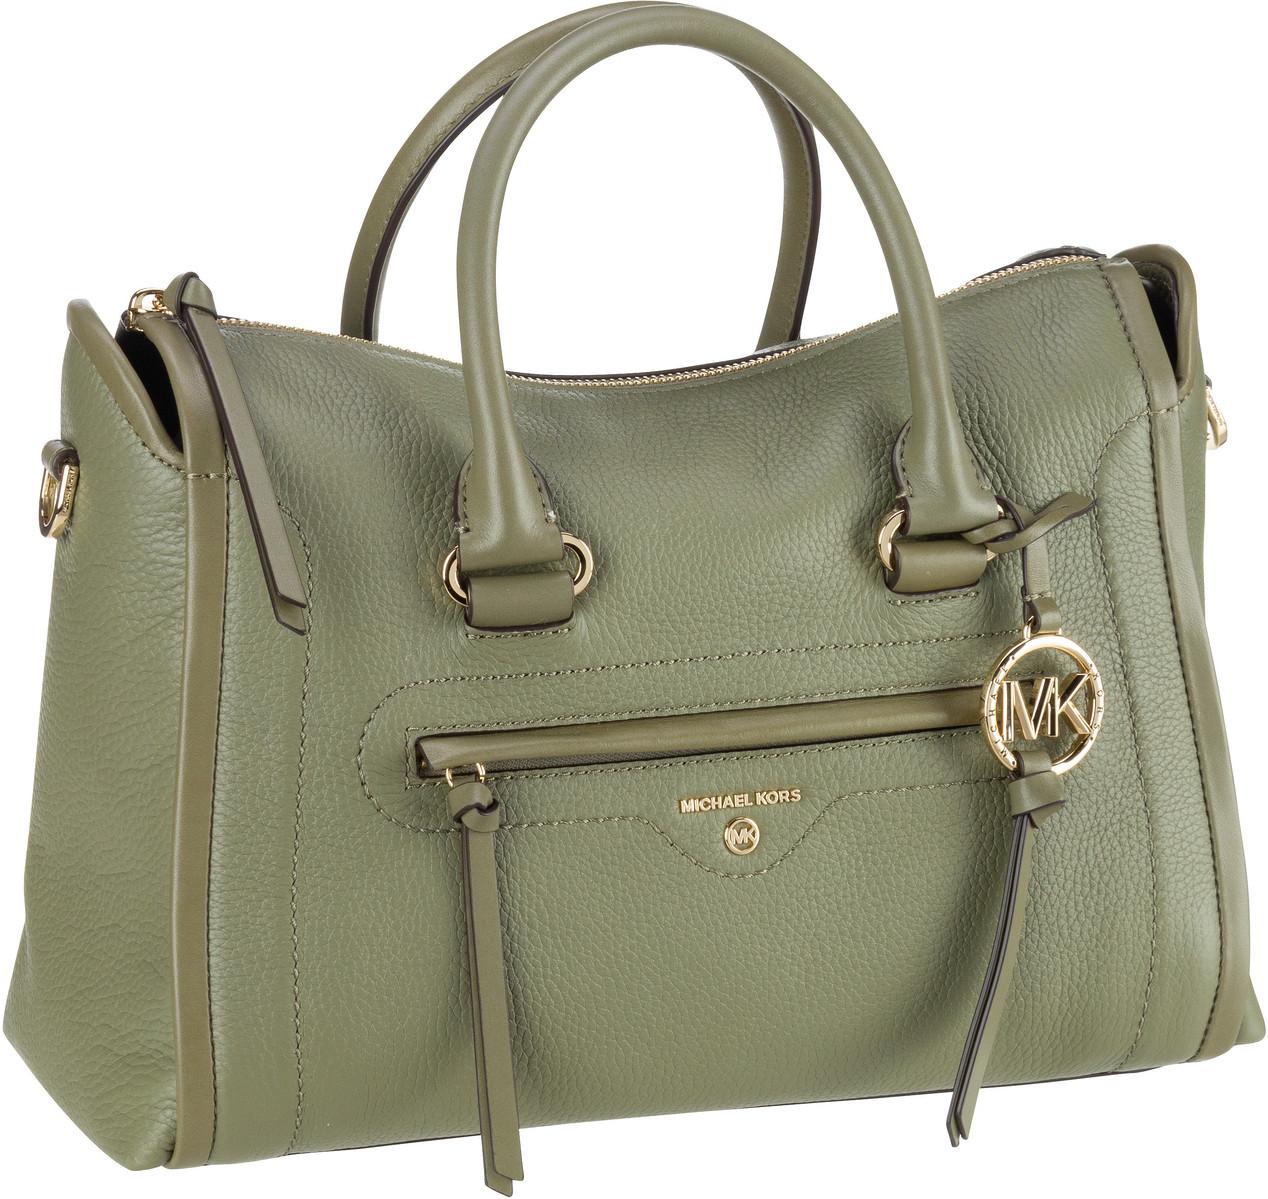 Michael Kors Handtasche Carine Medium Satchel Army Green